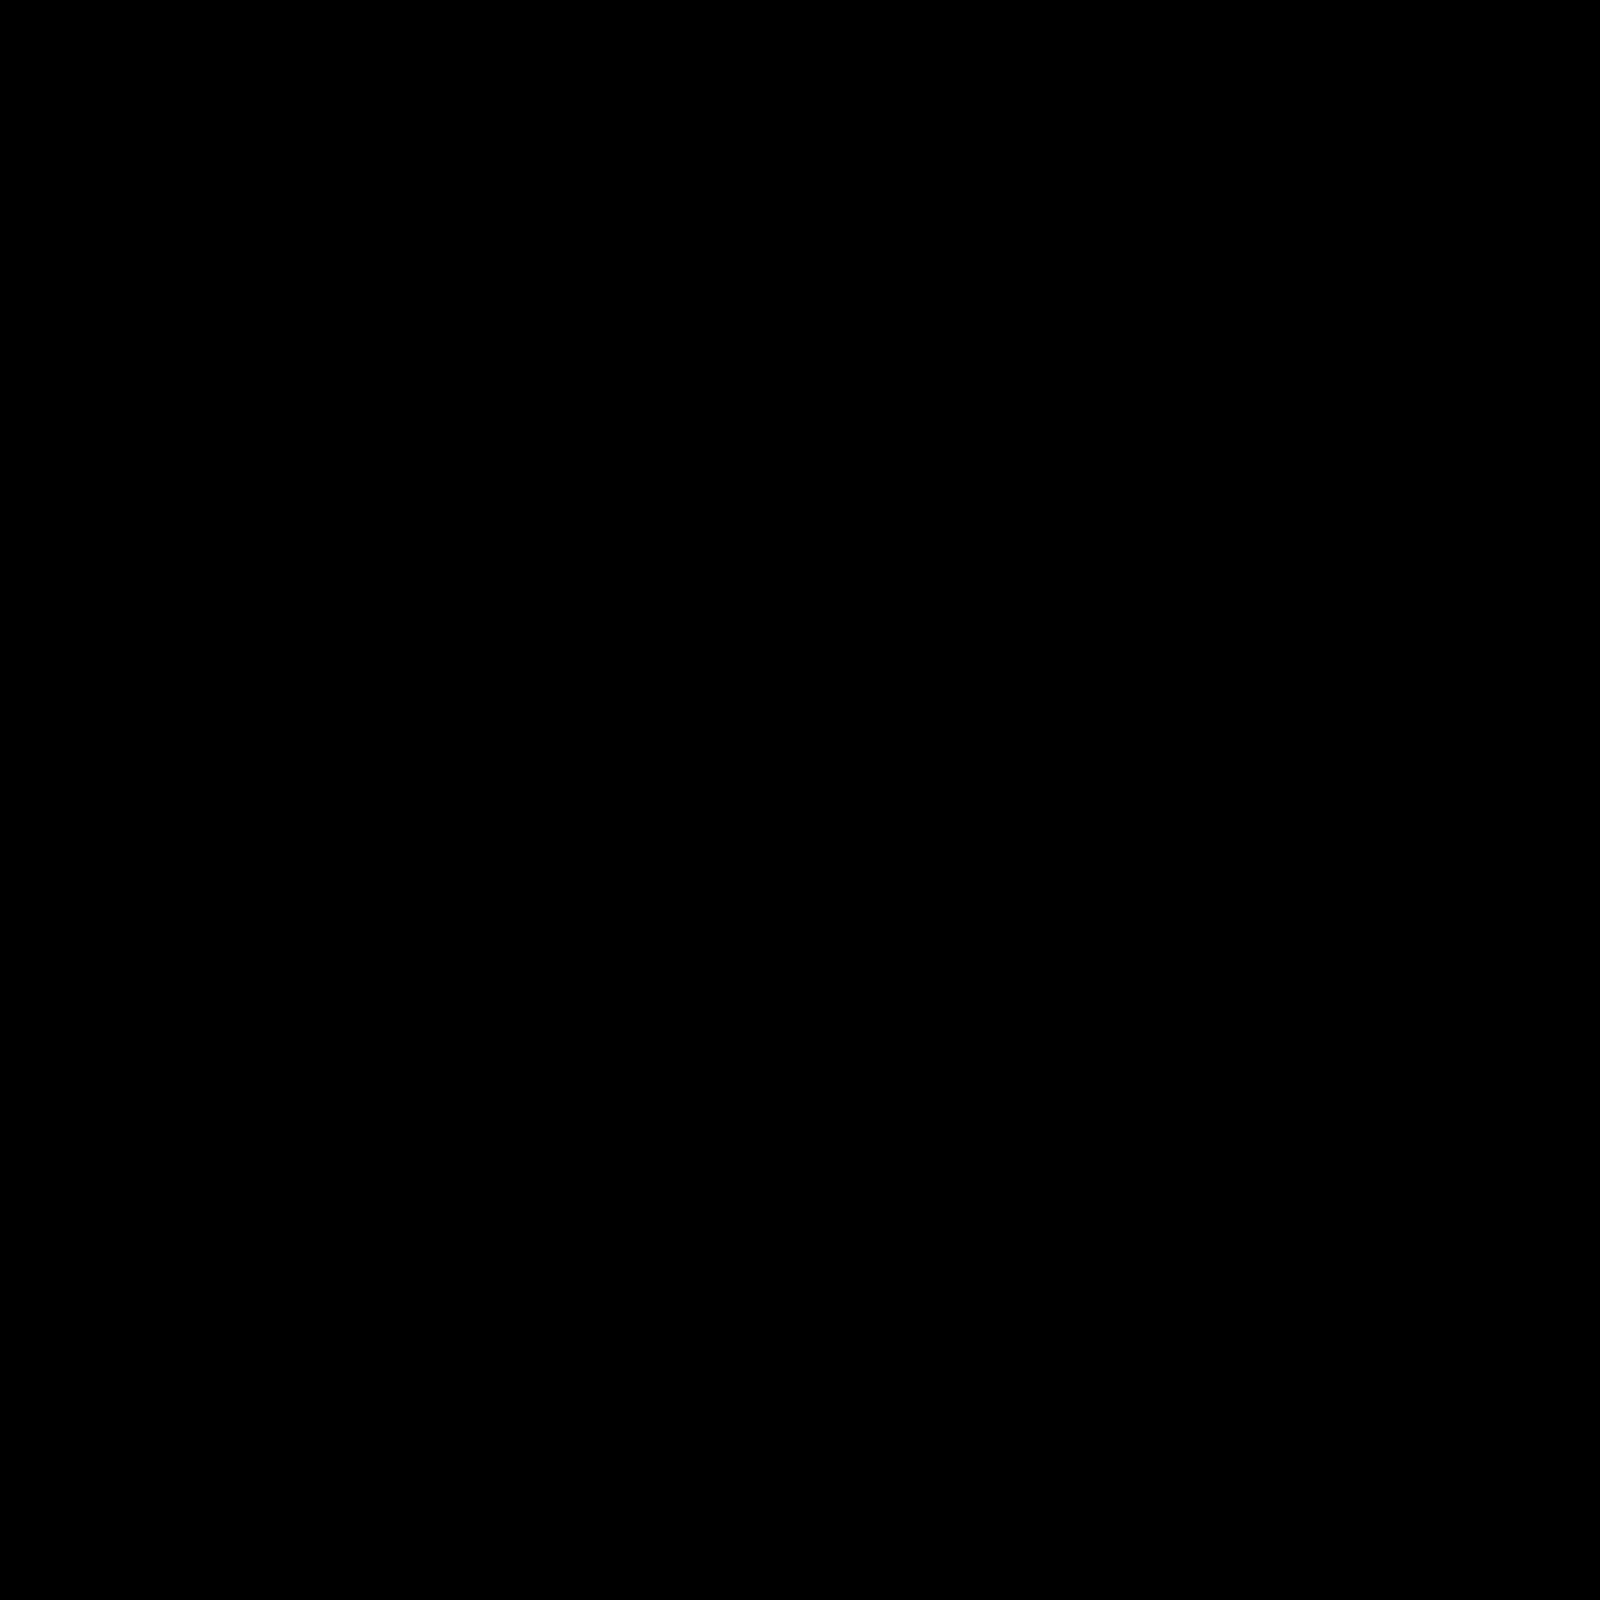 Wstążki AIDS  icon